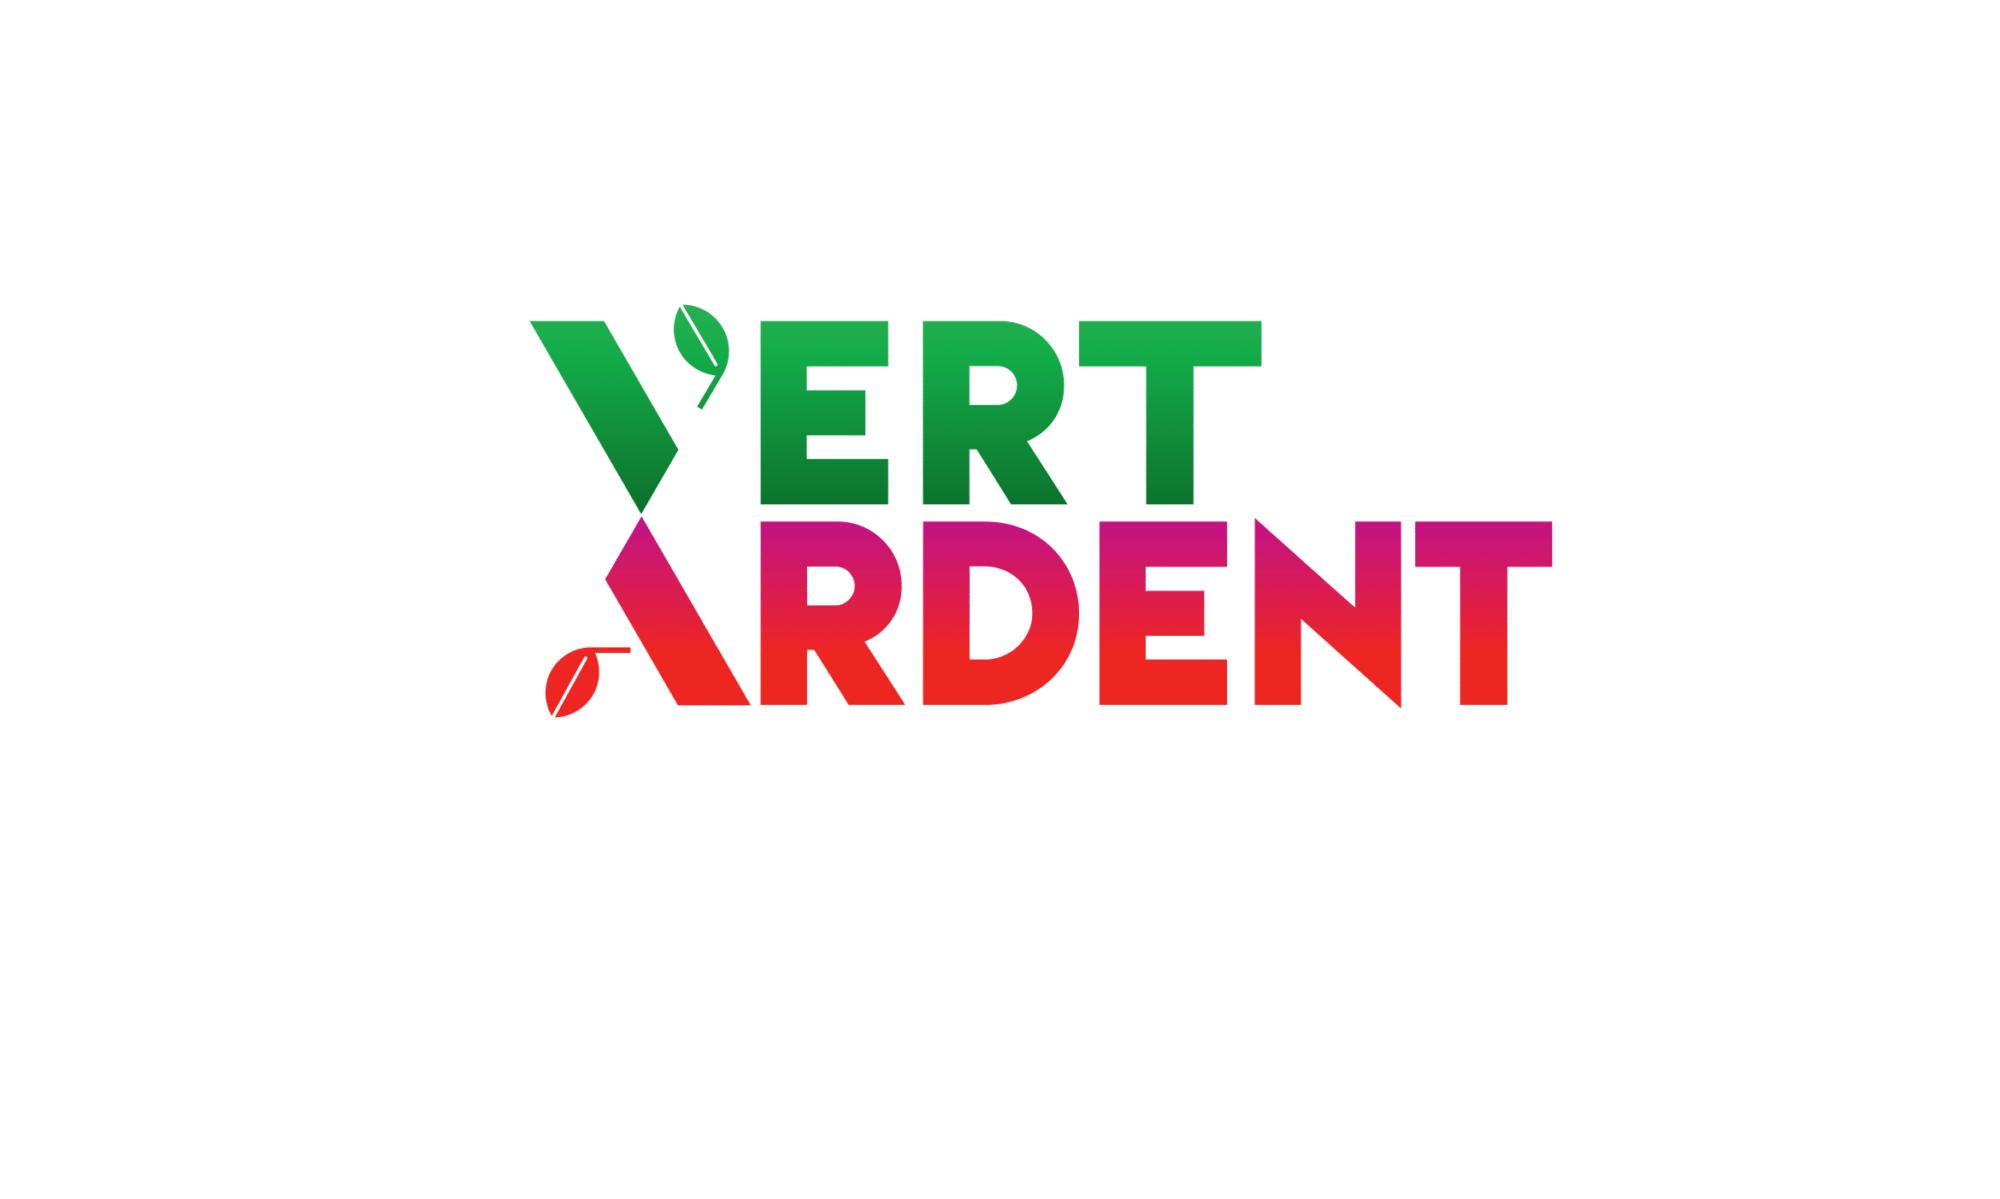 Vert Ardent